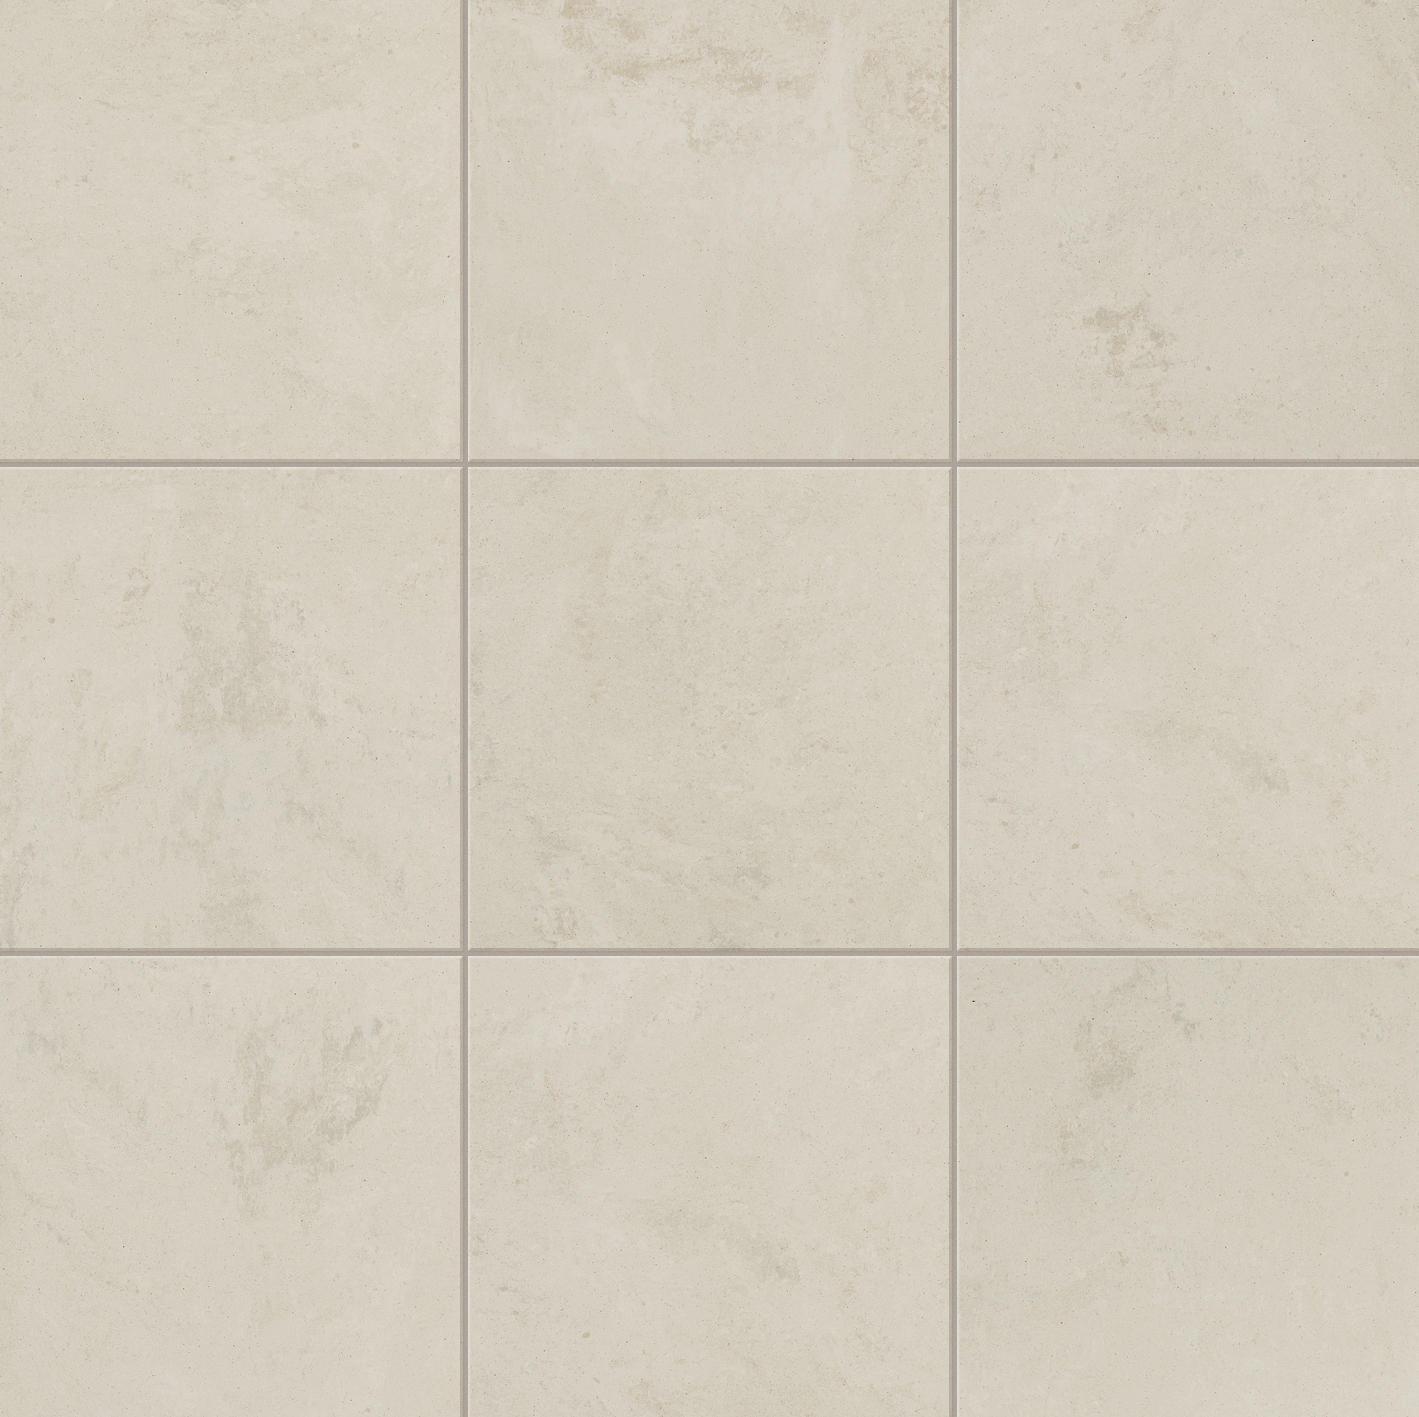 Empire Cadet White Ceramic Tiles From Crossville Architonic